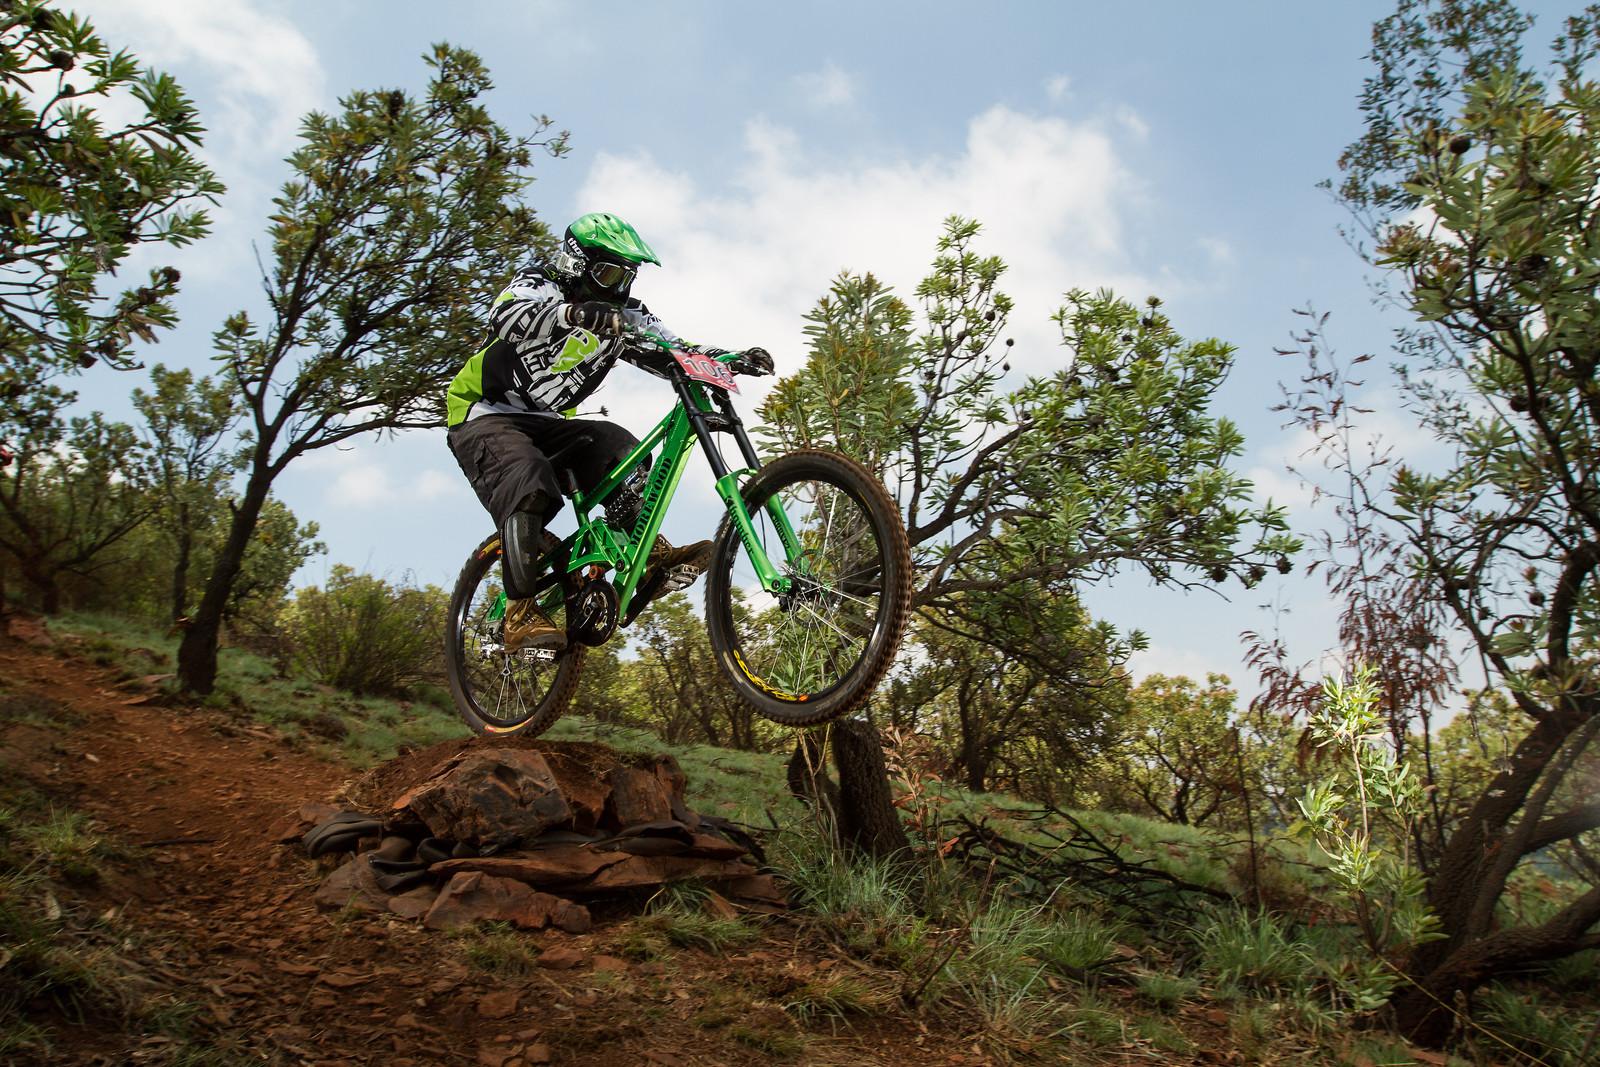 LC 20121014 8502 - Callum - Mountain Biking Pictures - Vital MTB